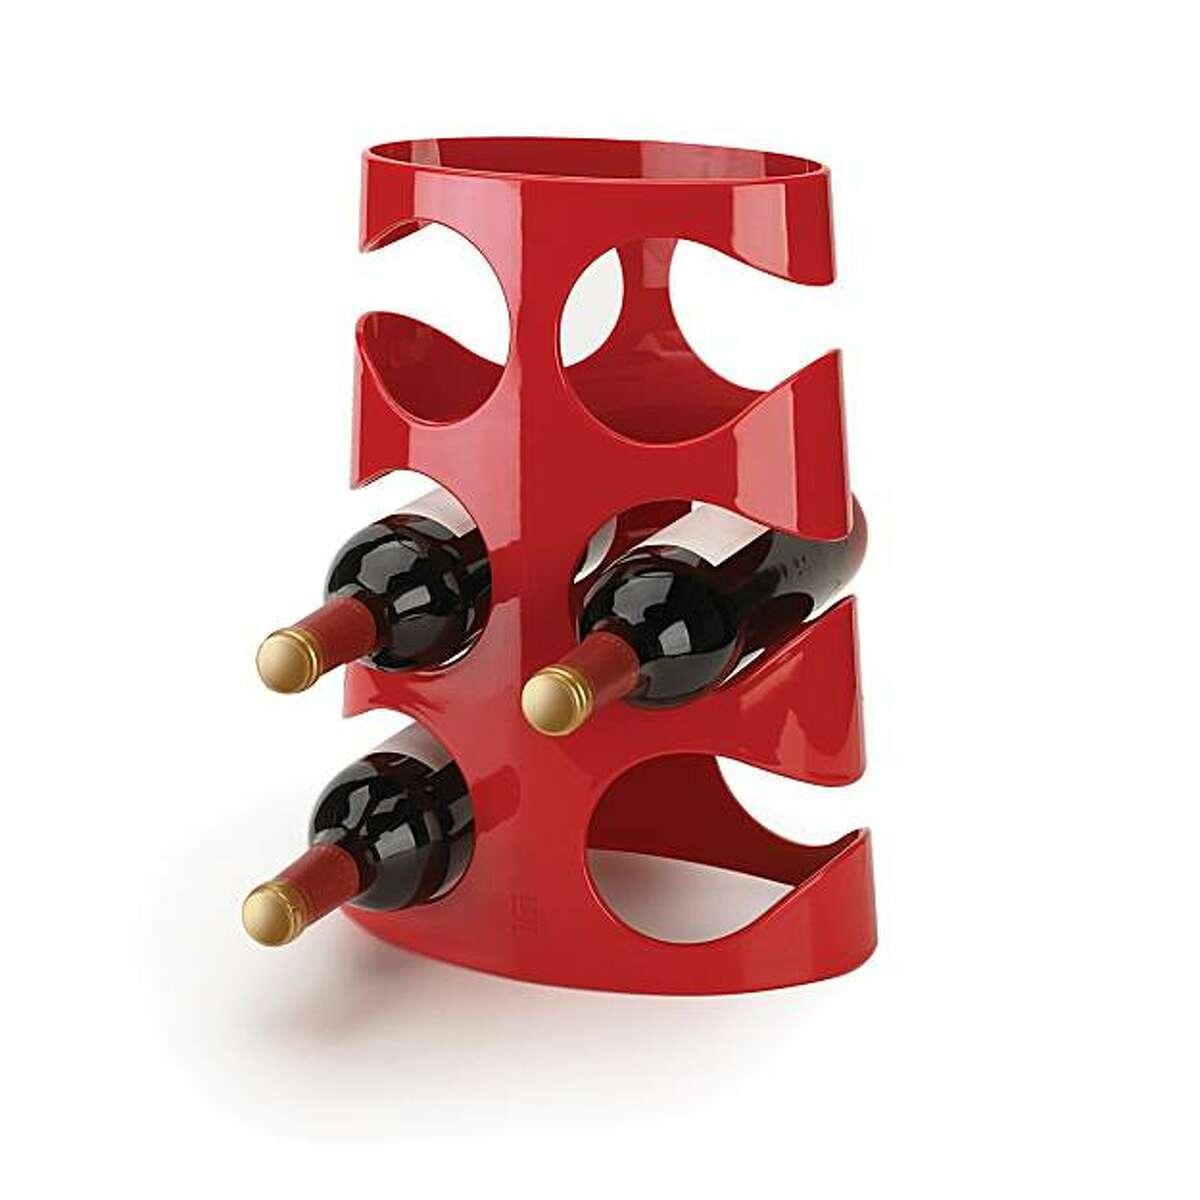 Ran Lerner's new Grapevine wine rack for Umbra,